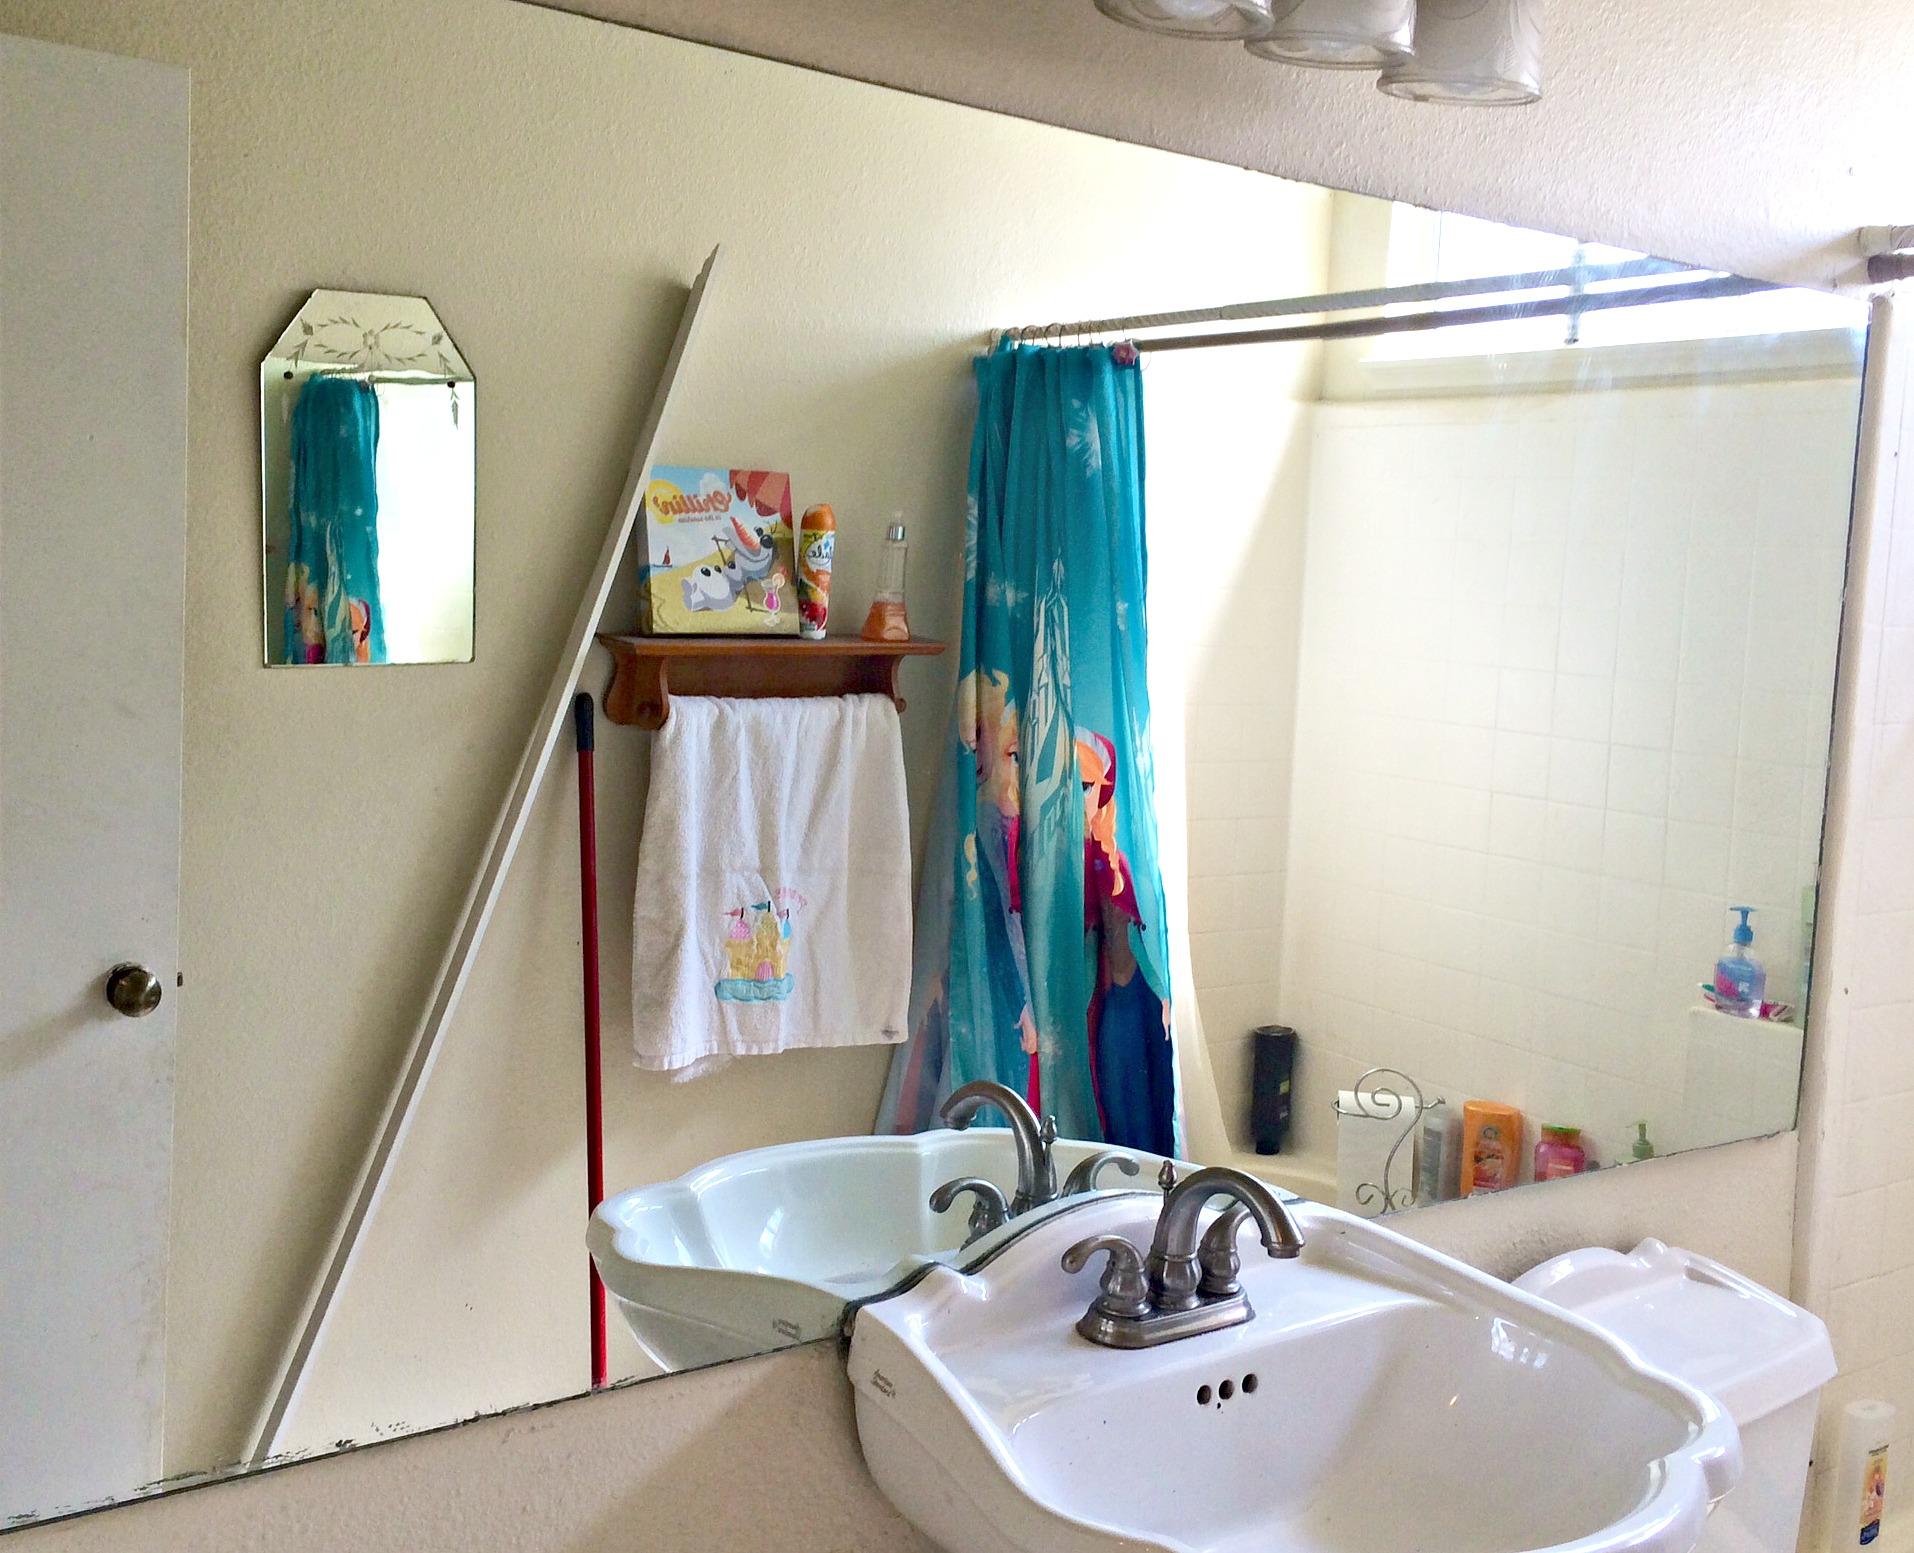 bathroommirror2.jpg